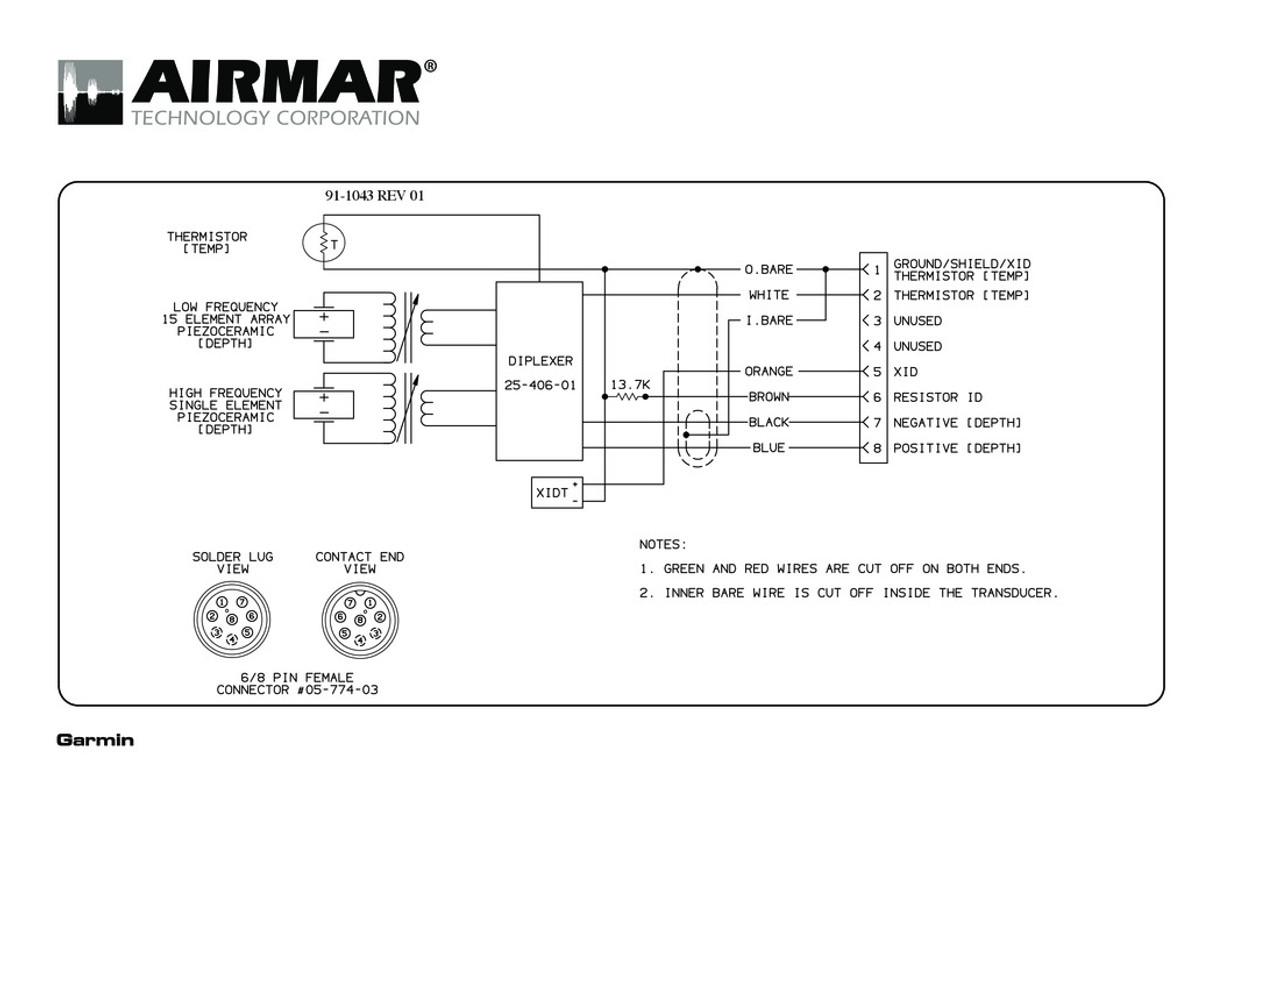 medium resolution of airmar wiring diagram garmin r99 8 pin d t blue bottle marine garmin 8 pin wiring diagram